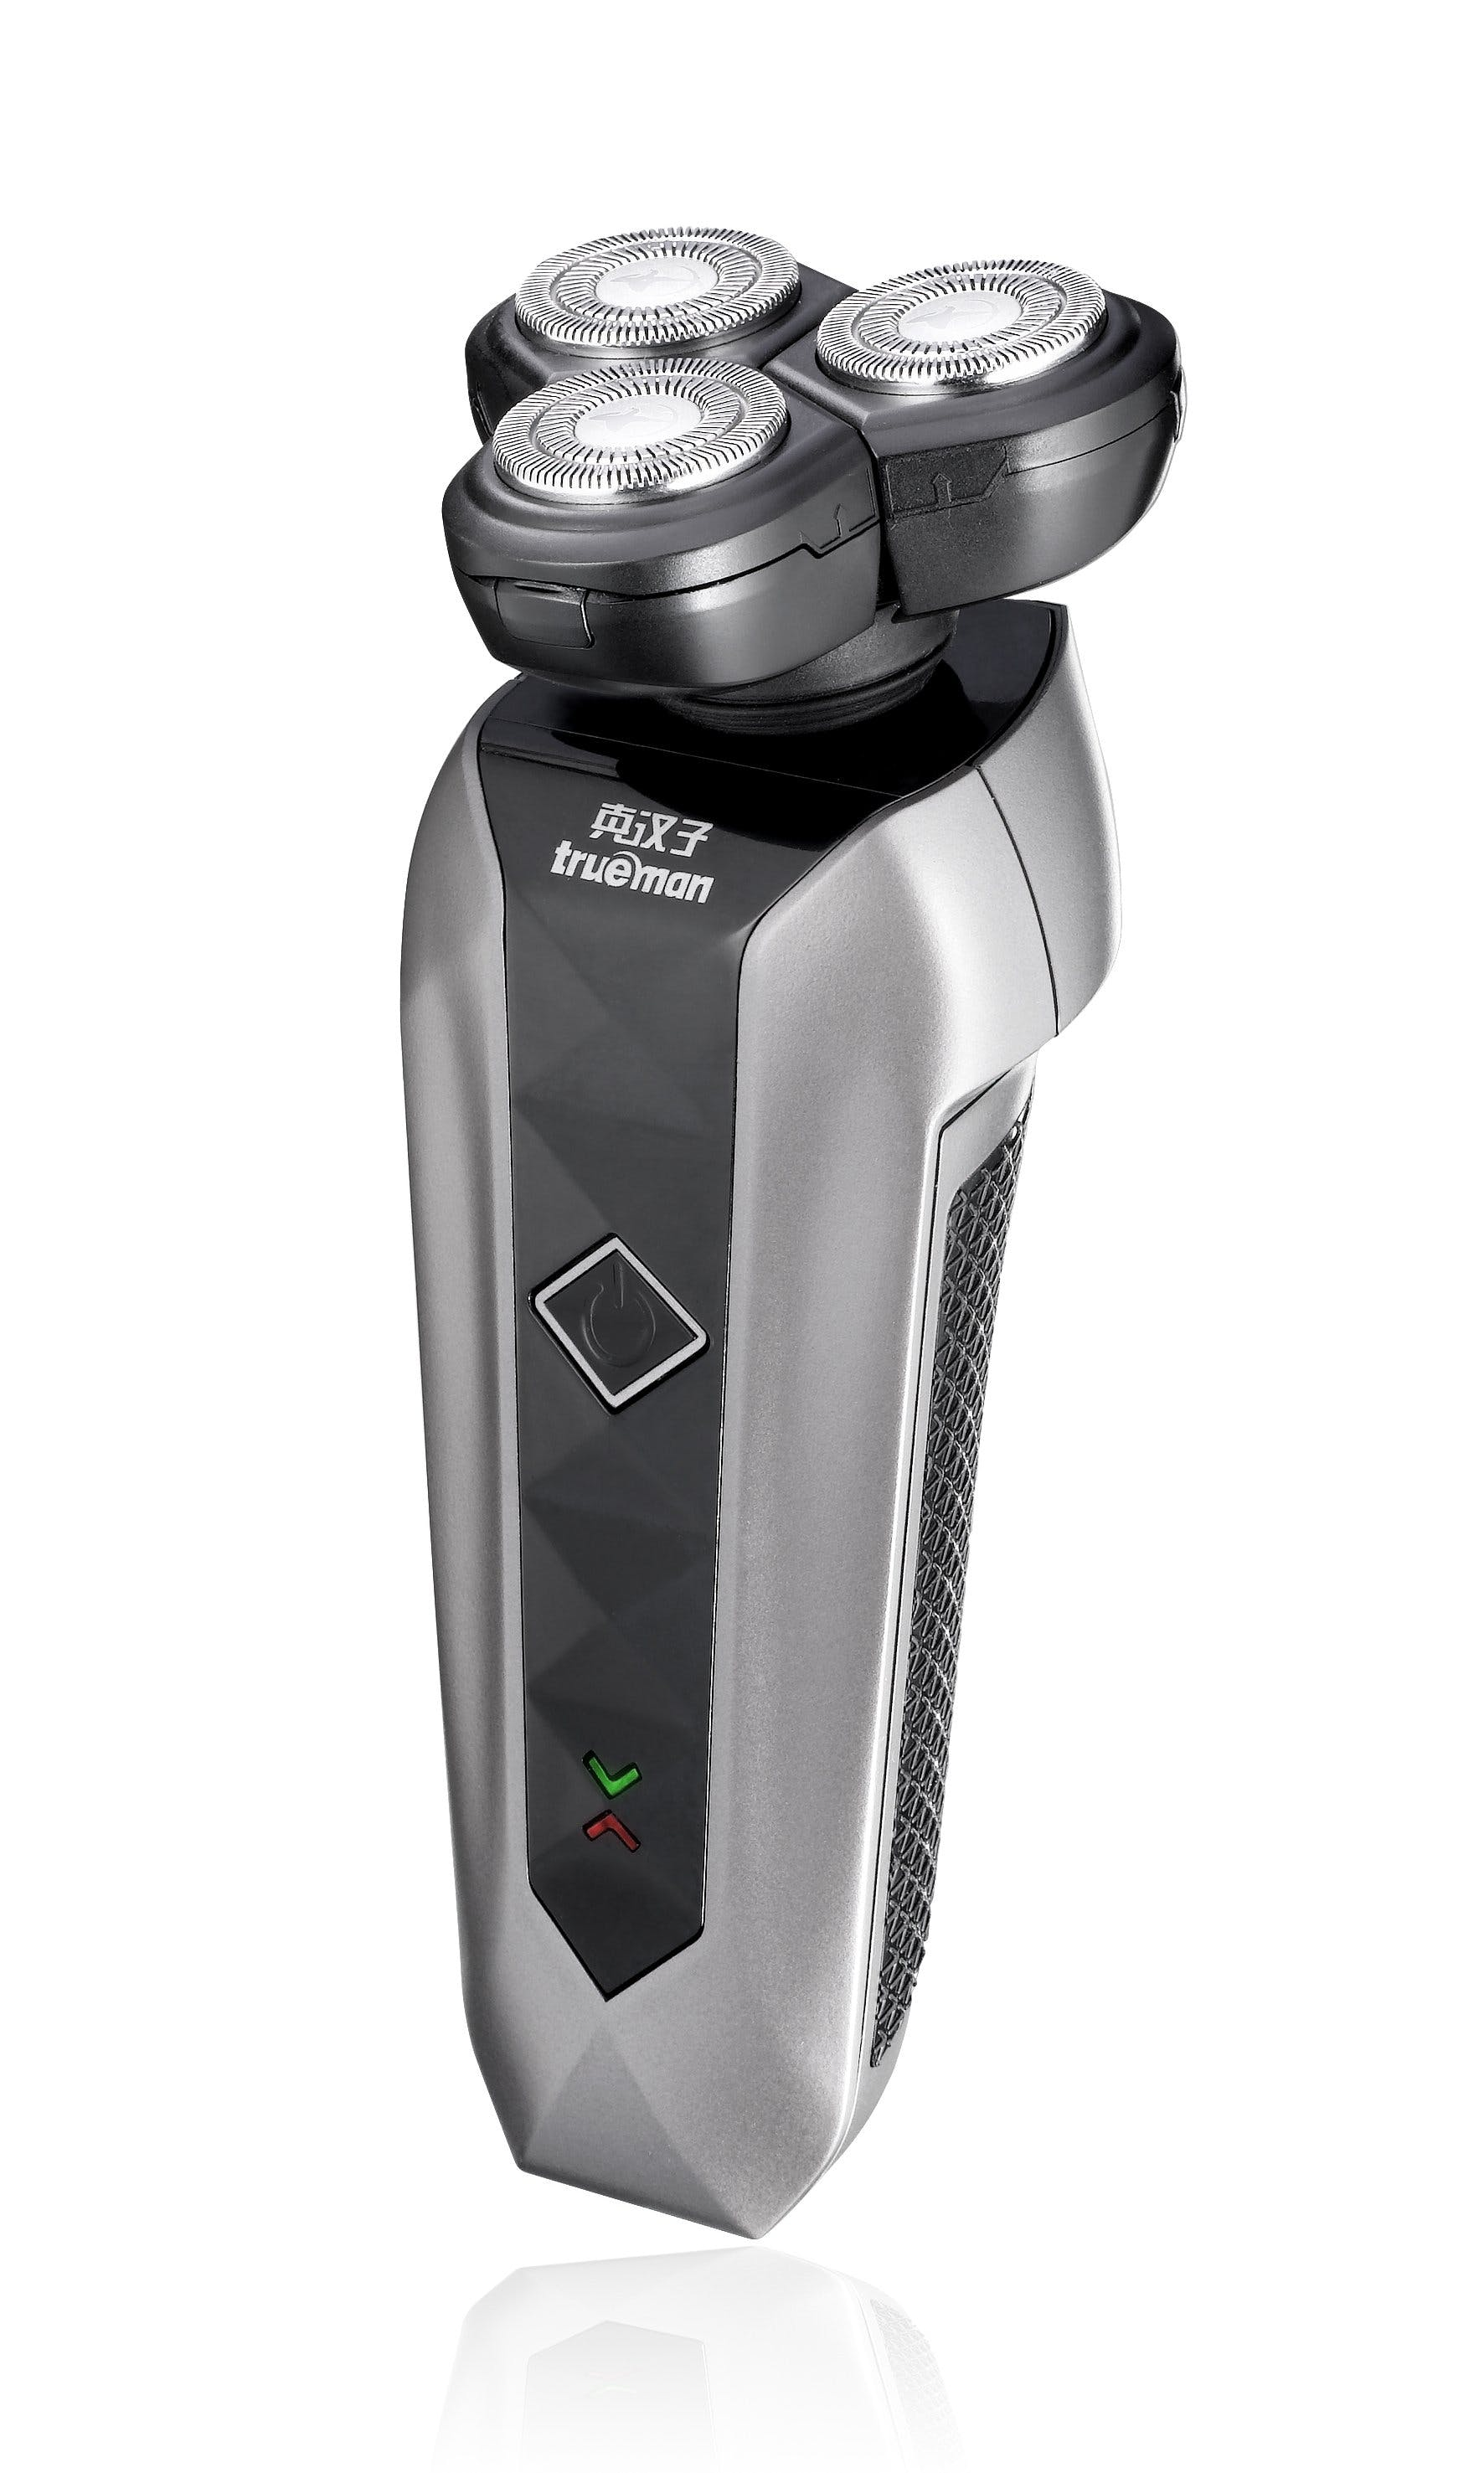 brand, close-up, electric razor